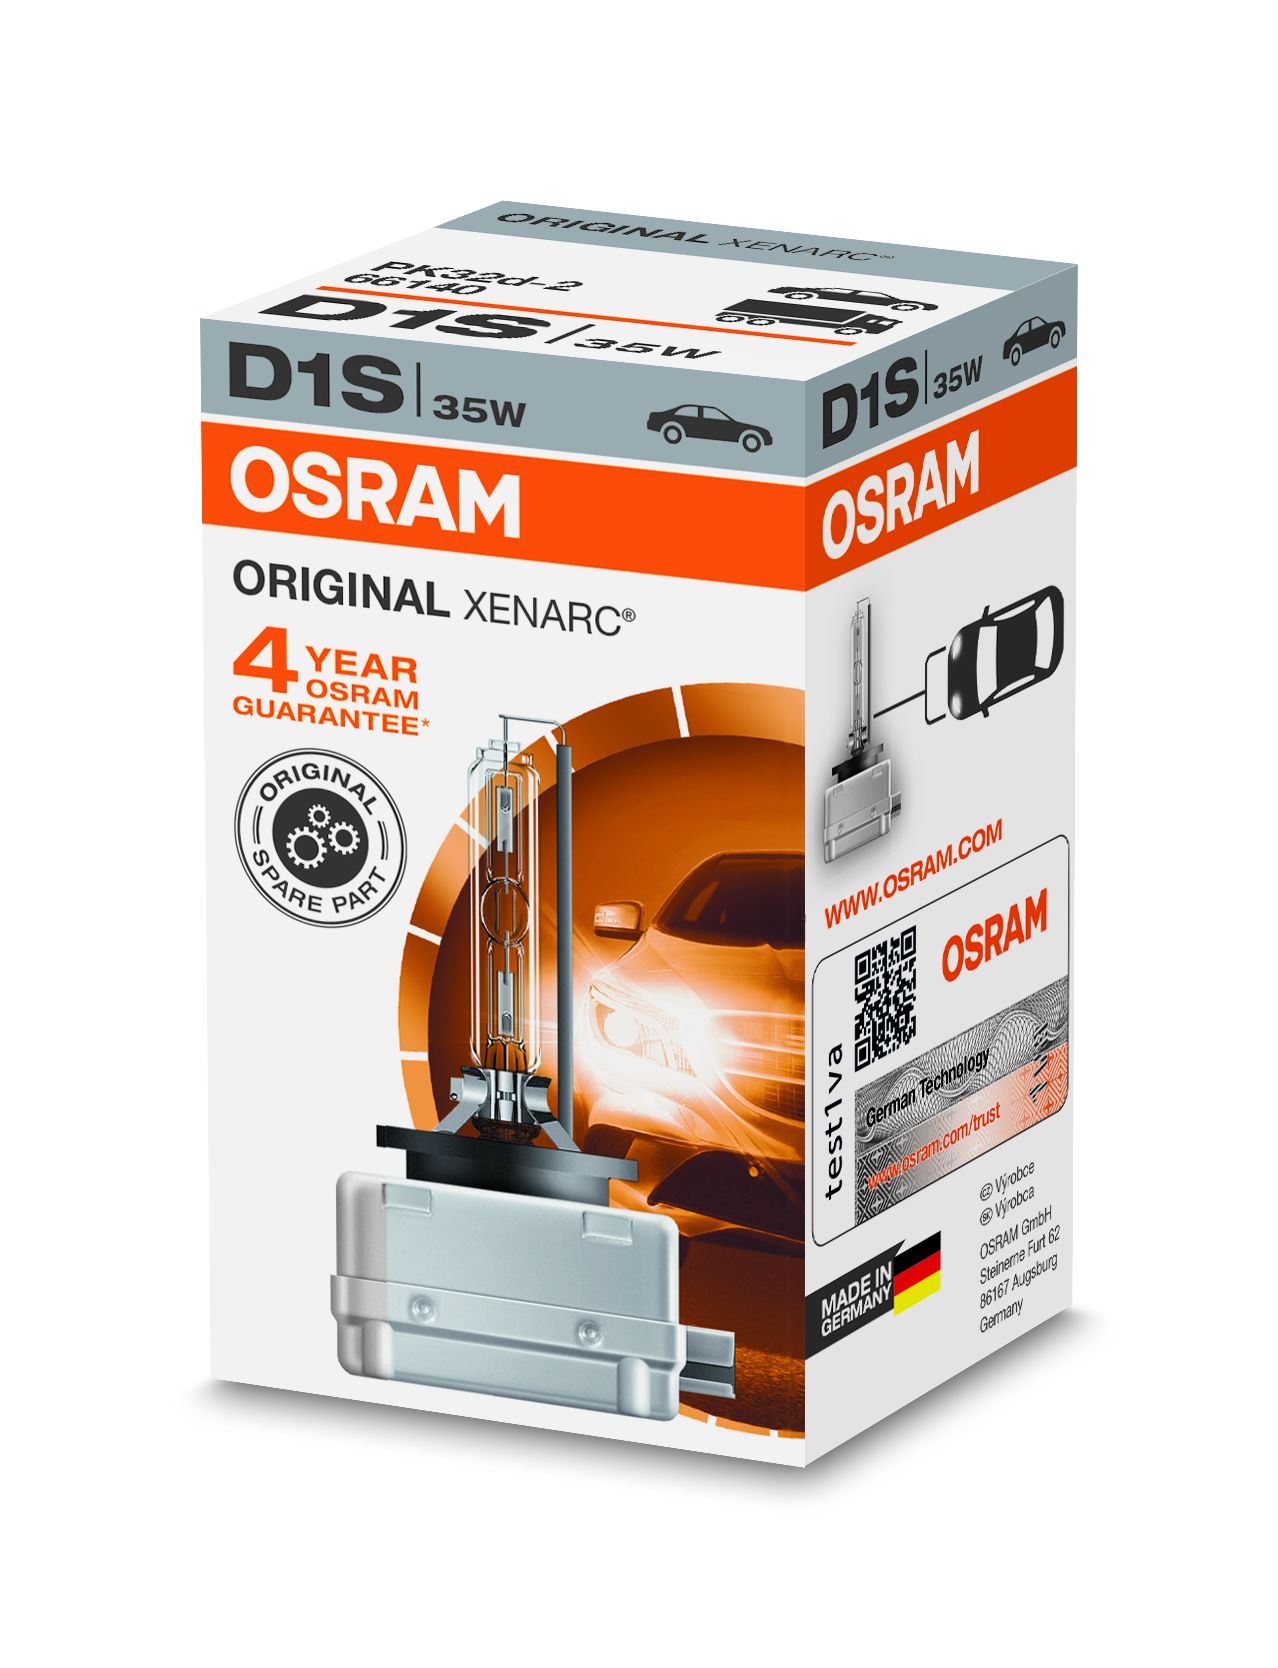 Osram Xenonová výbojka, XENARC, D1S, PK32d-2, 12/24V, 35W, 66140